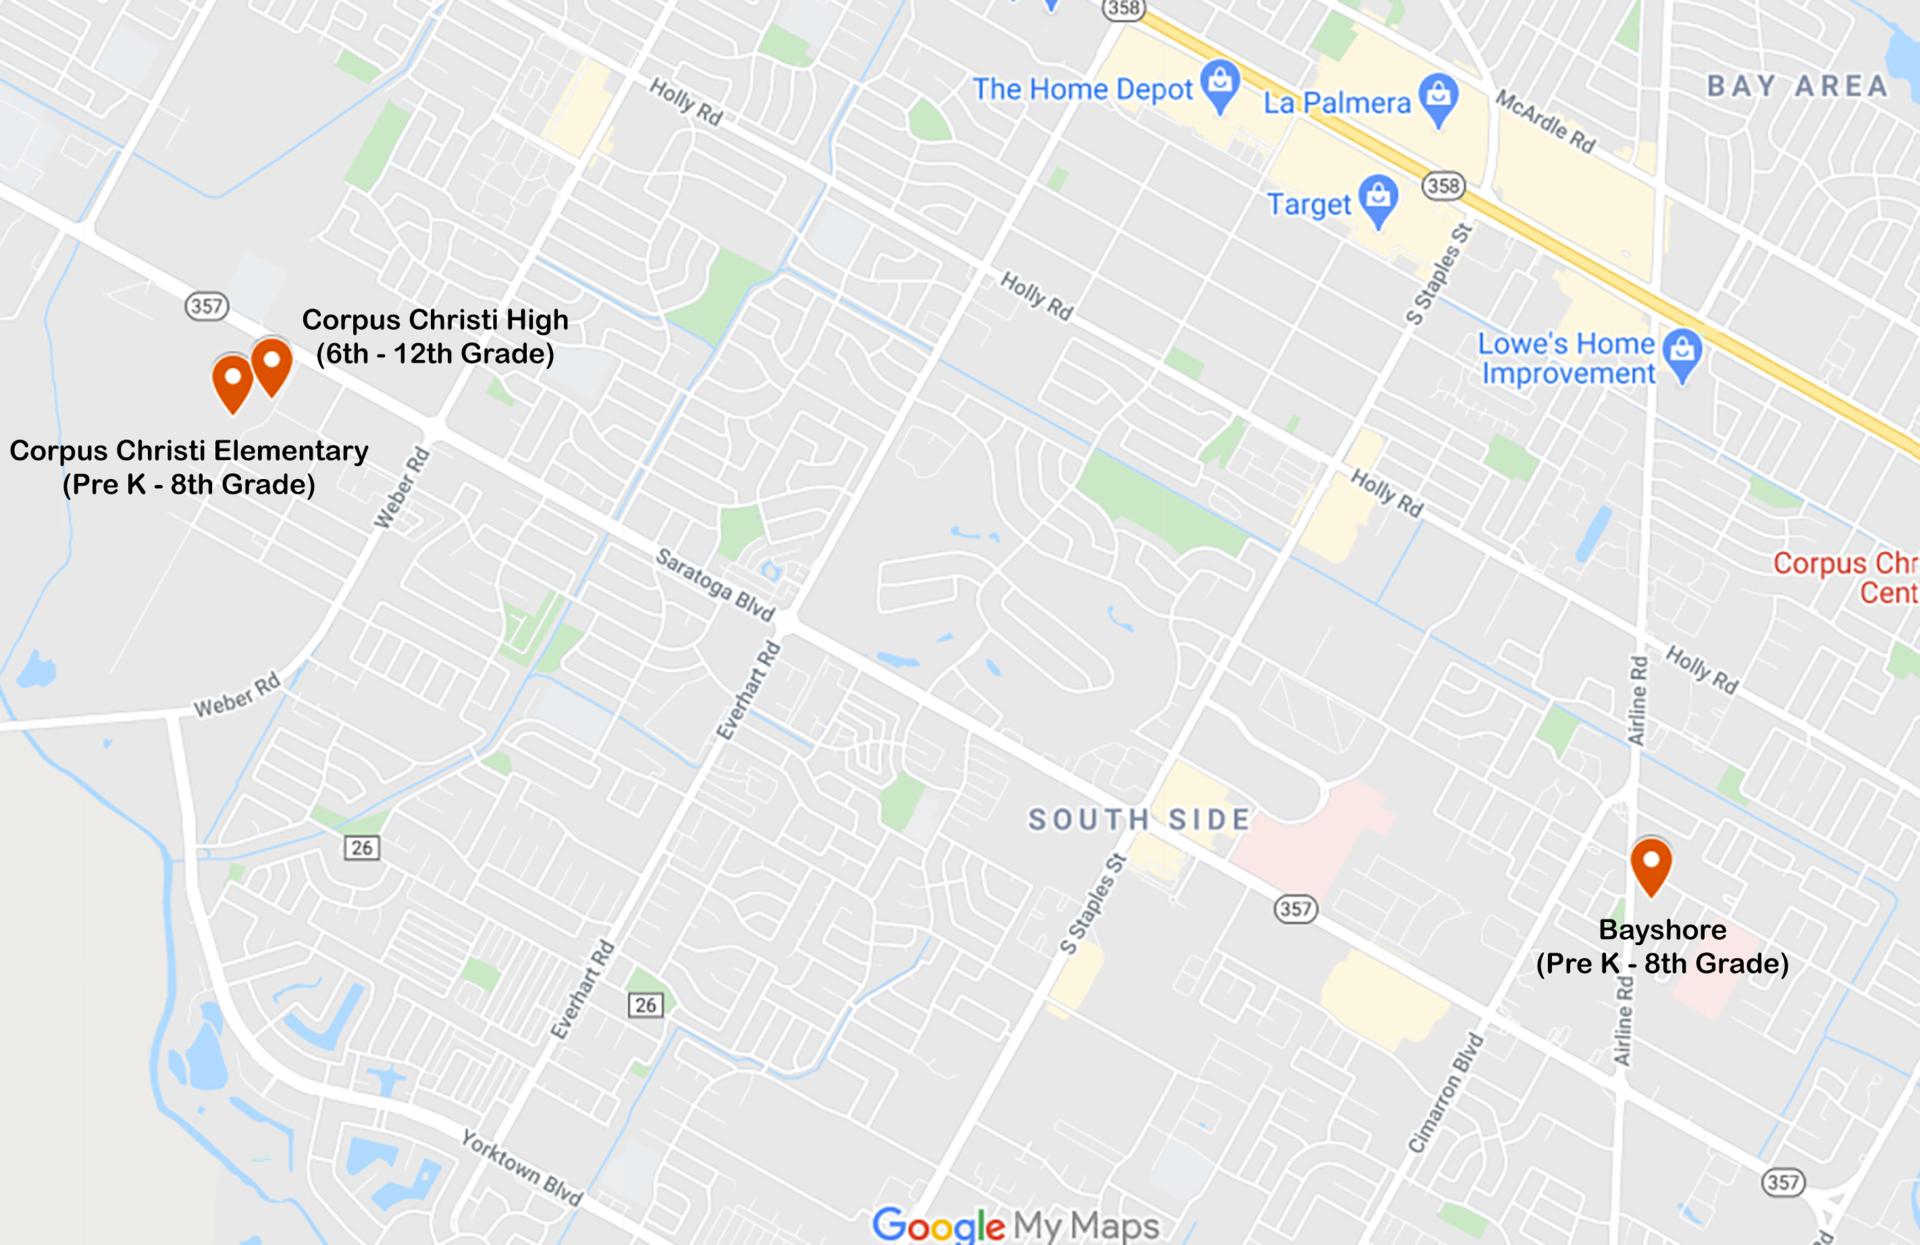 SST Schools in Corpus Christi Area